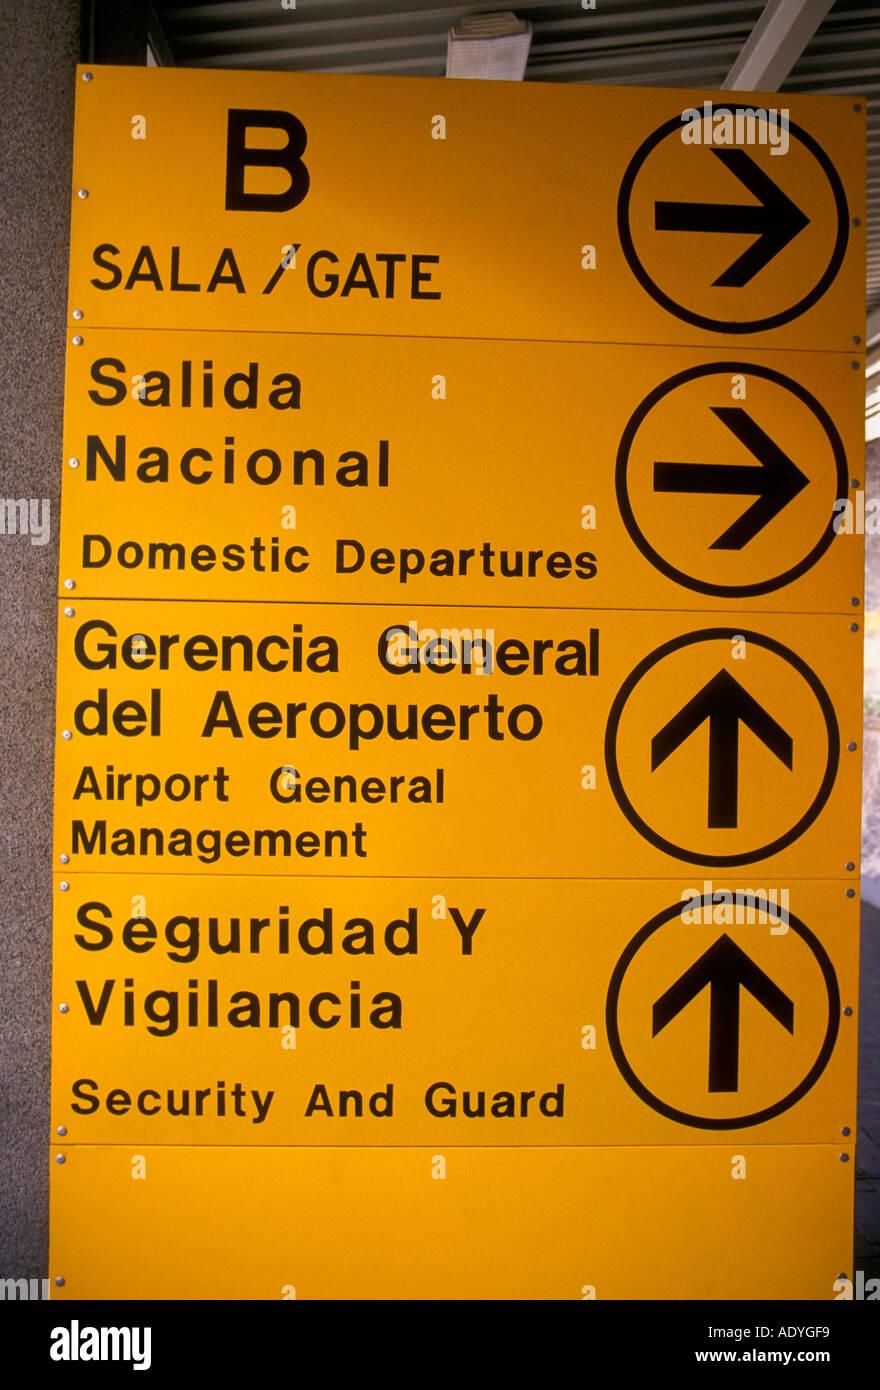 Mexico City Airport Stock Photos & Mexico City Airport